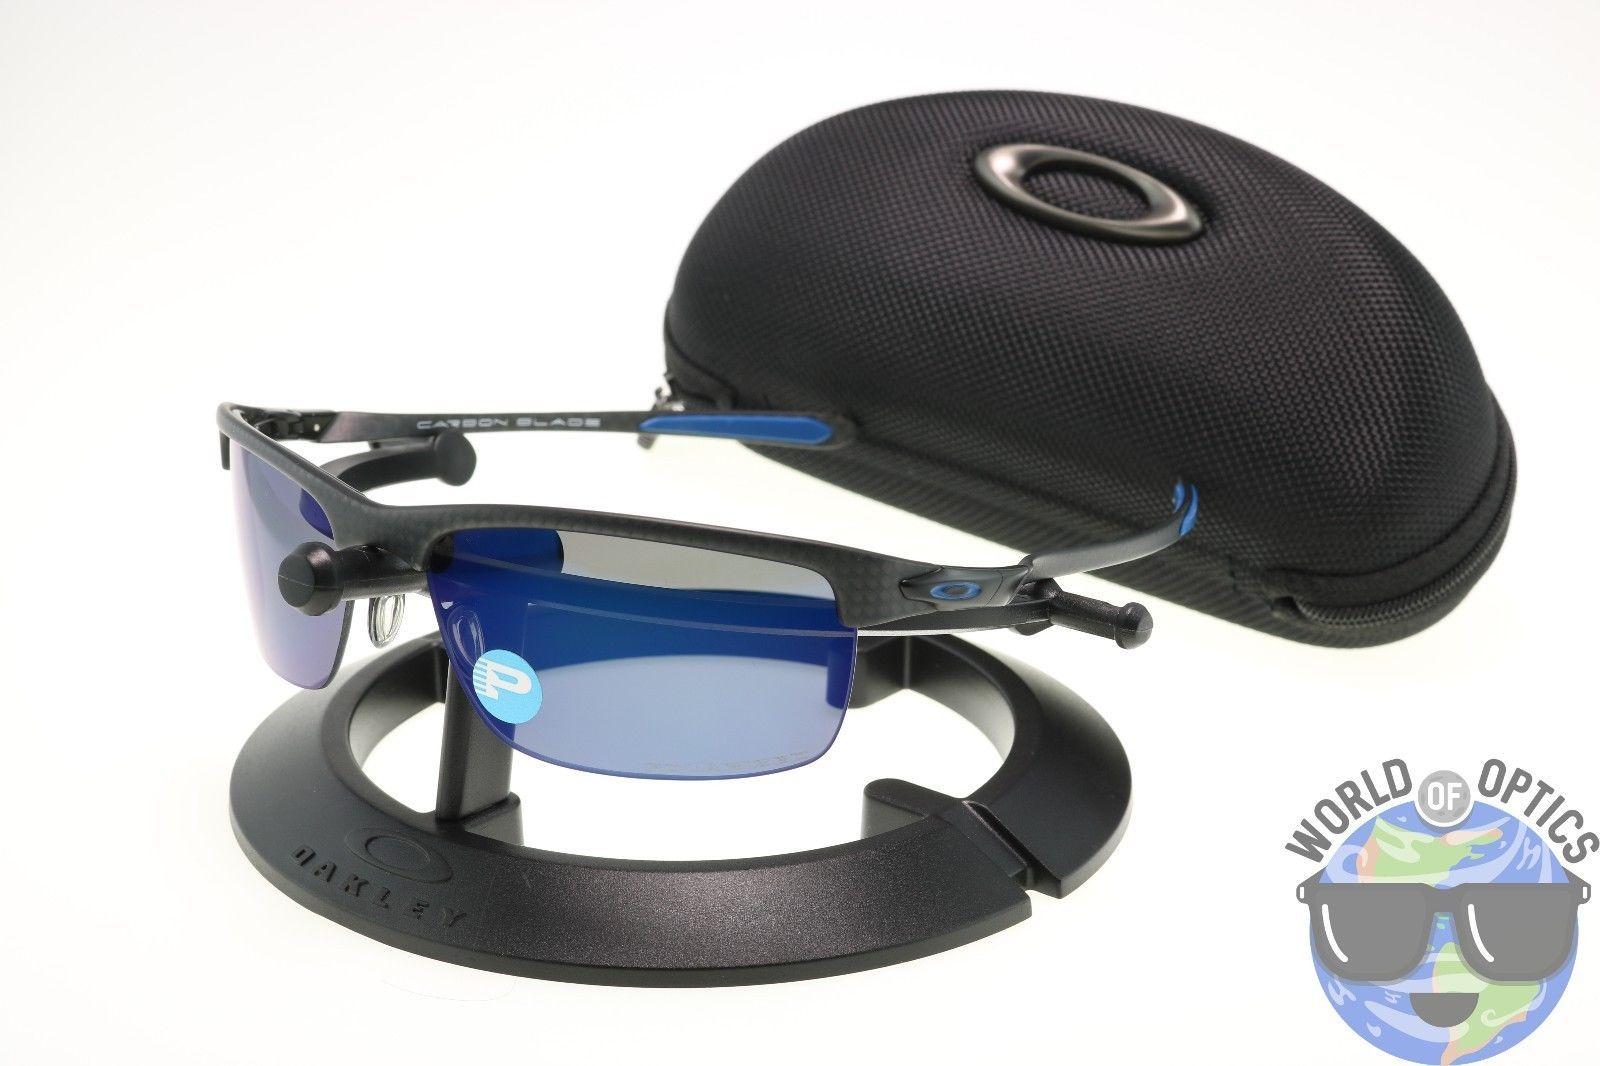 63c3f2f9181fb Oakley Carbon Blade Sunglasses OO9174-05 Matte Carbon w  Ice Iridium  Polarized